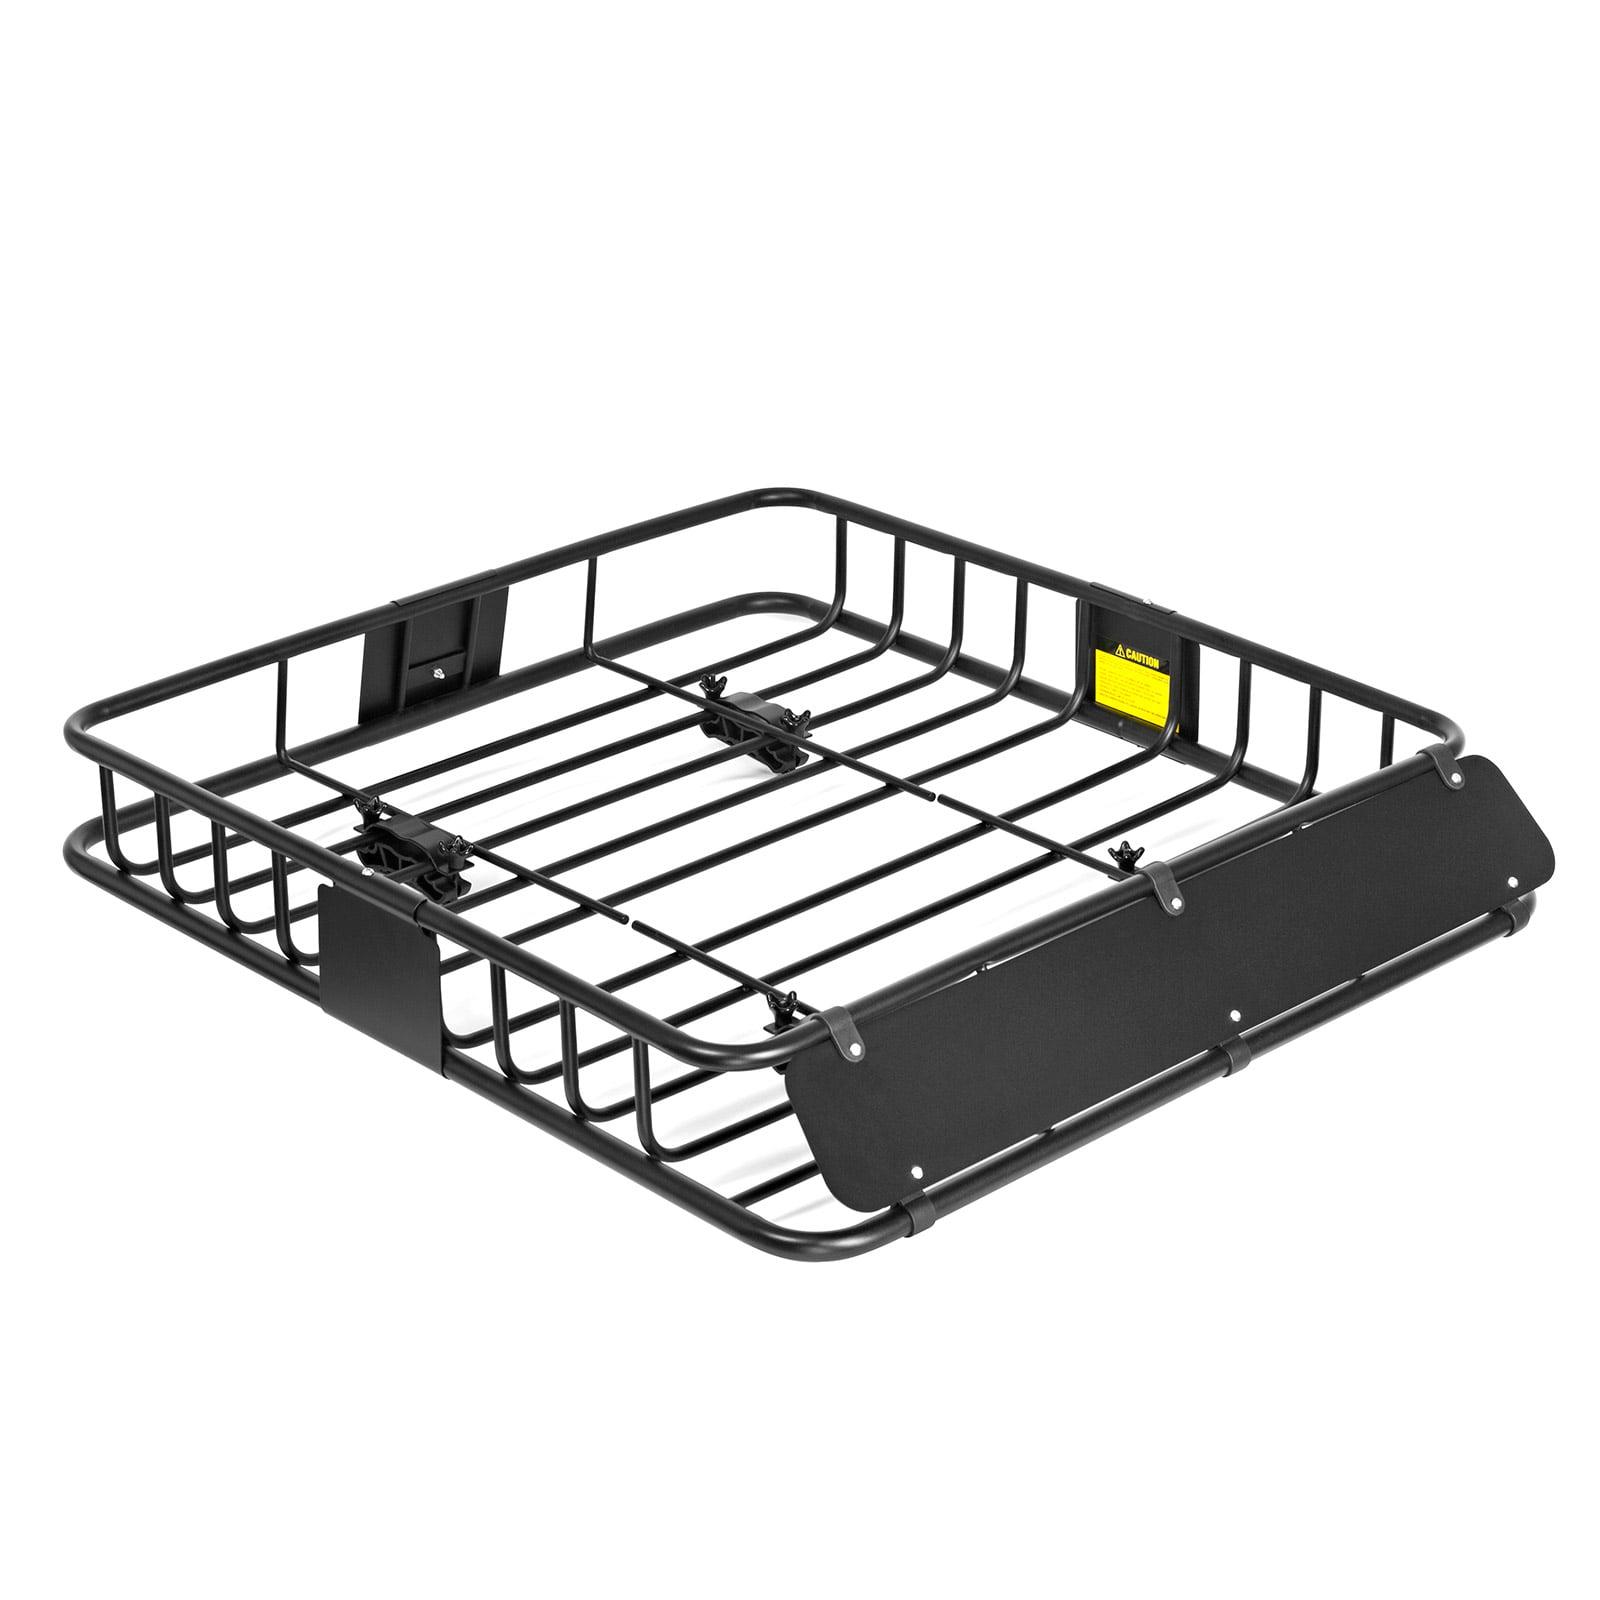 "Direct Aftermarket  Black Universal Roof Rack Cargo Car SUV Van Top Luggage Holder Carrier Basket Travel SUV 44"" x 39"" x 6"""